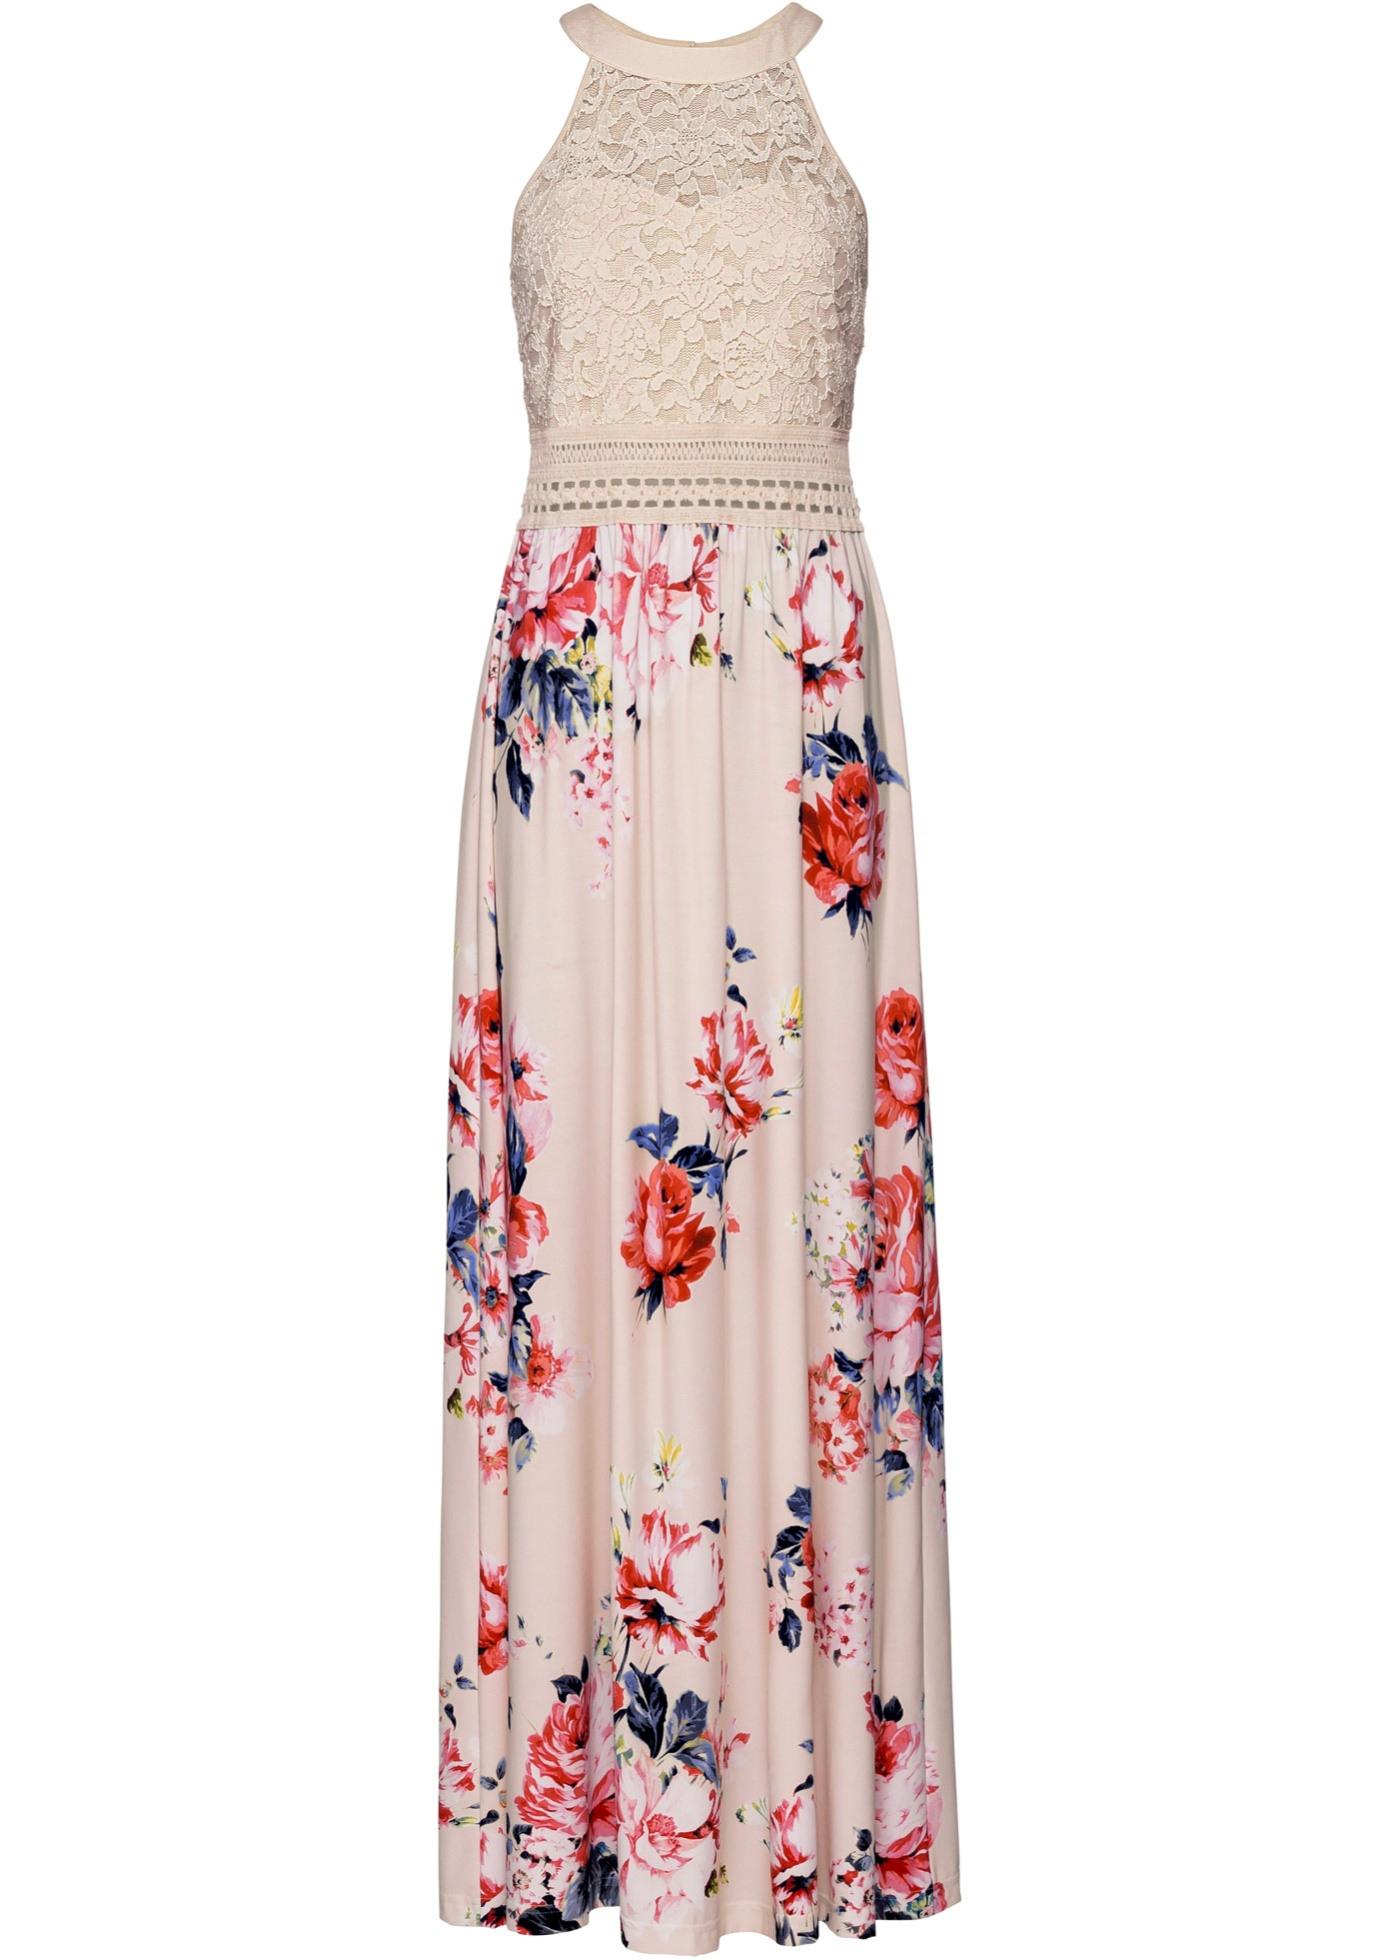 Abend Einfach Sommerkleid Gr 52 Spezialgebiet20 Kreativ Sommerkleid Gr 52 Ärmel